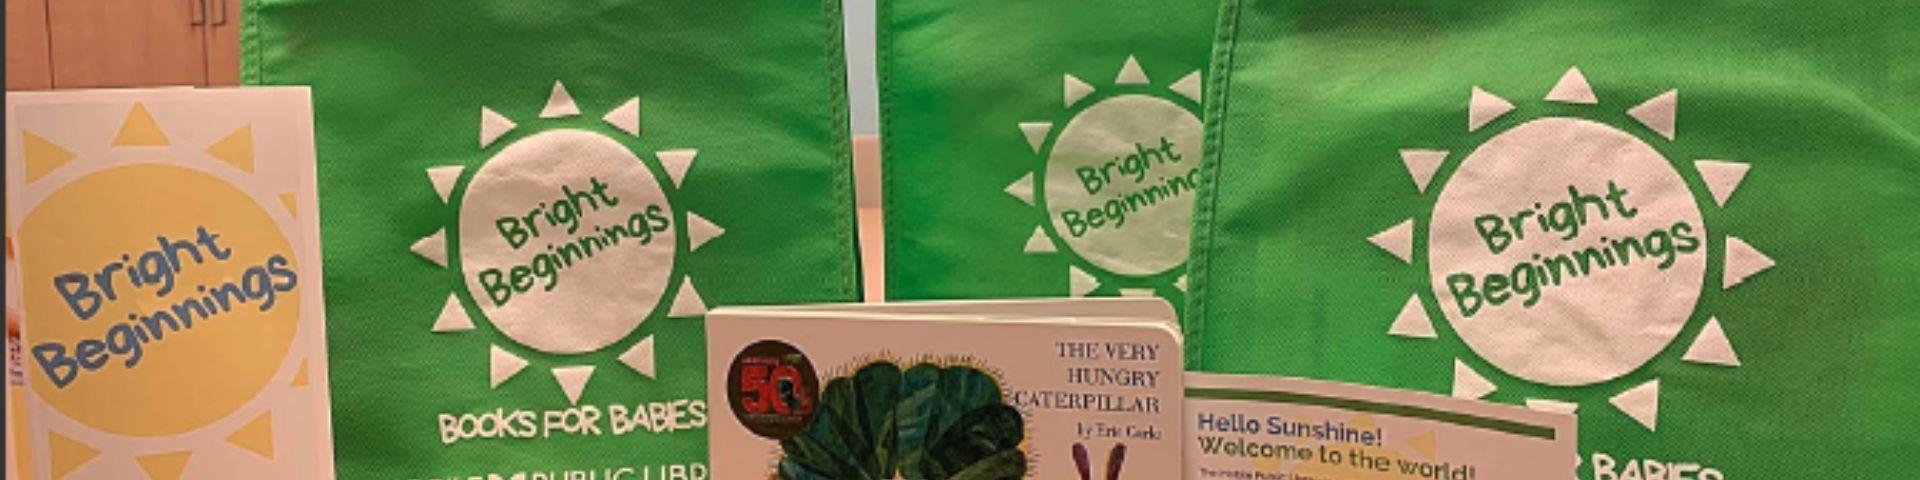 Bright Beginnings Bag